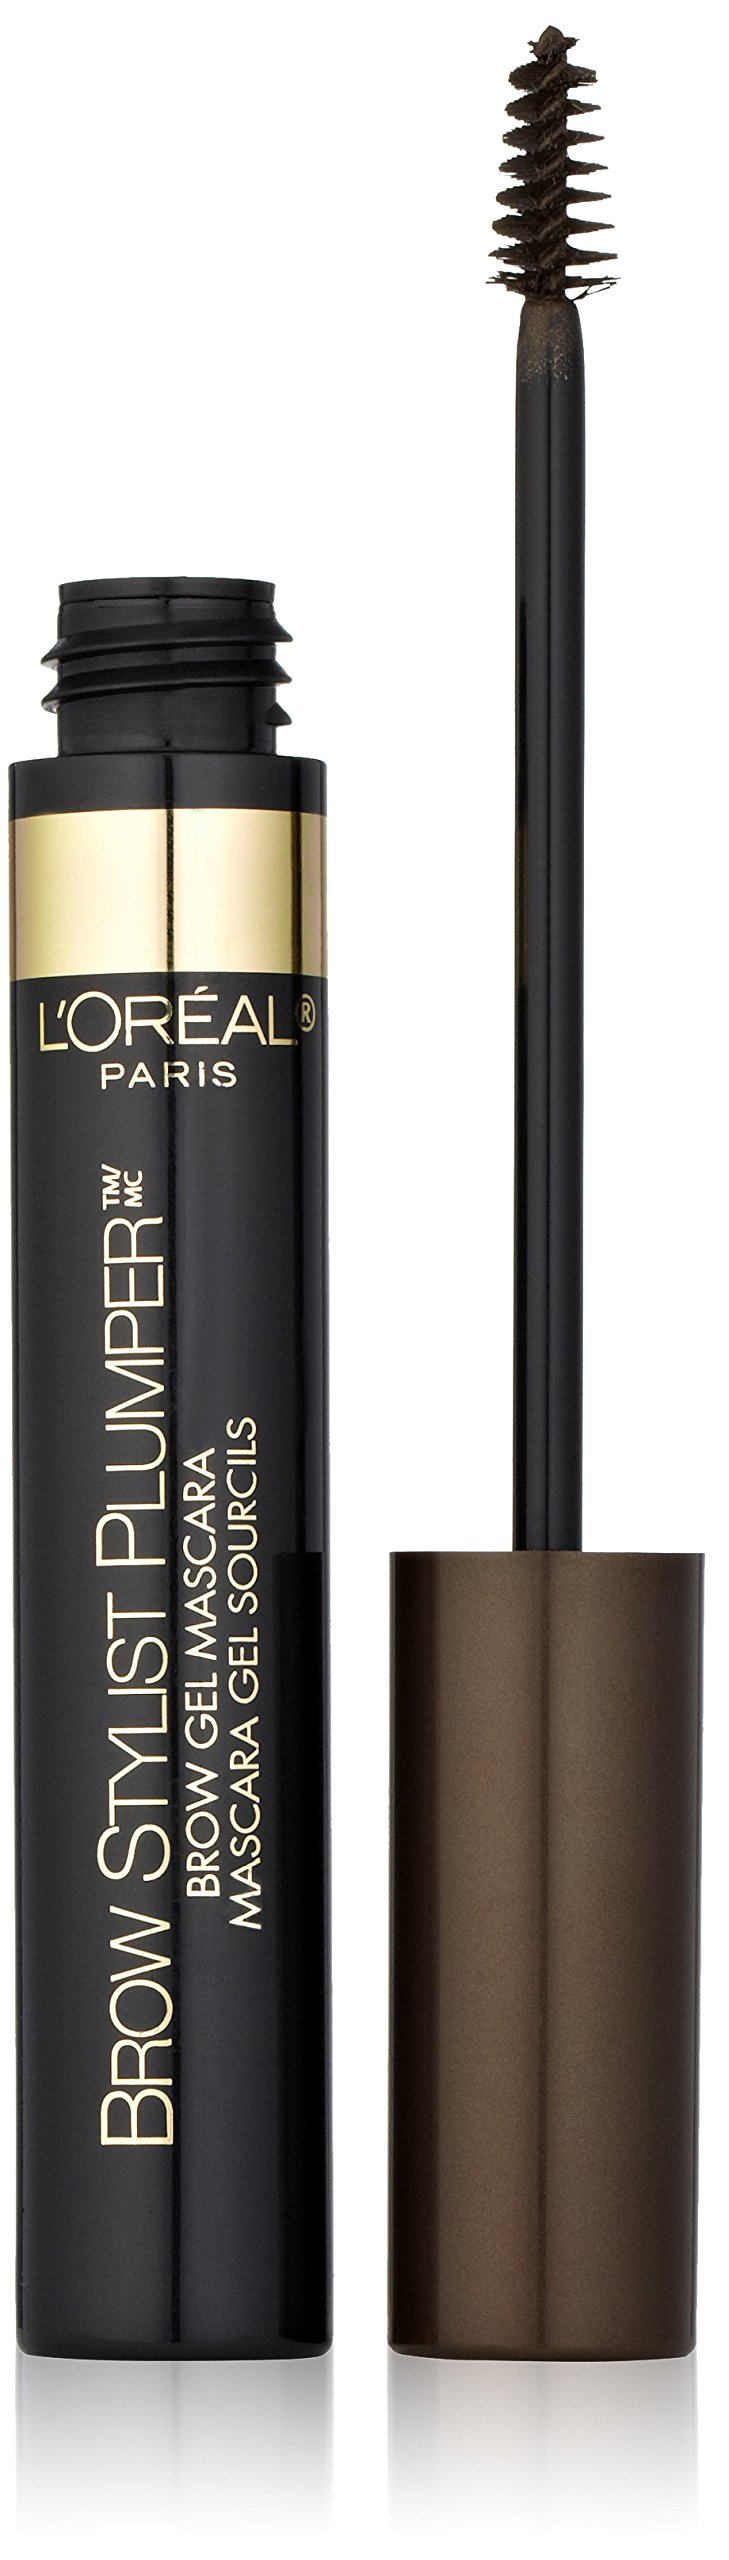 Amazoncom Loréal Paris Brow Stylist Brow Plumper Light To